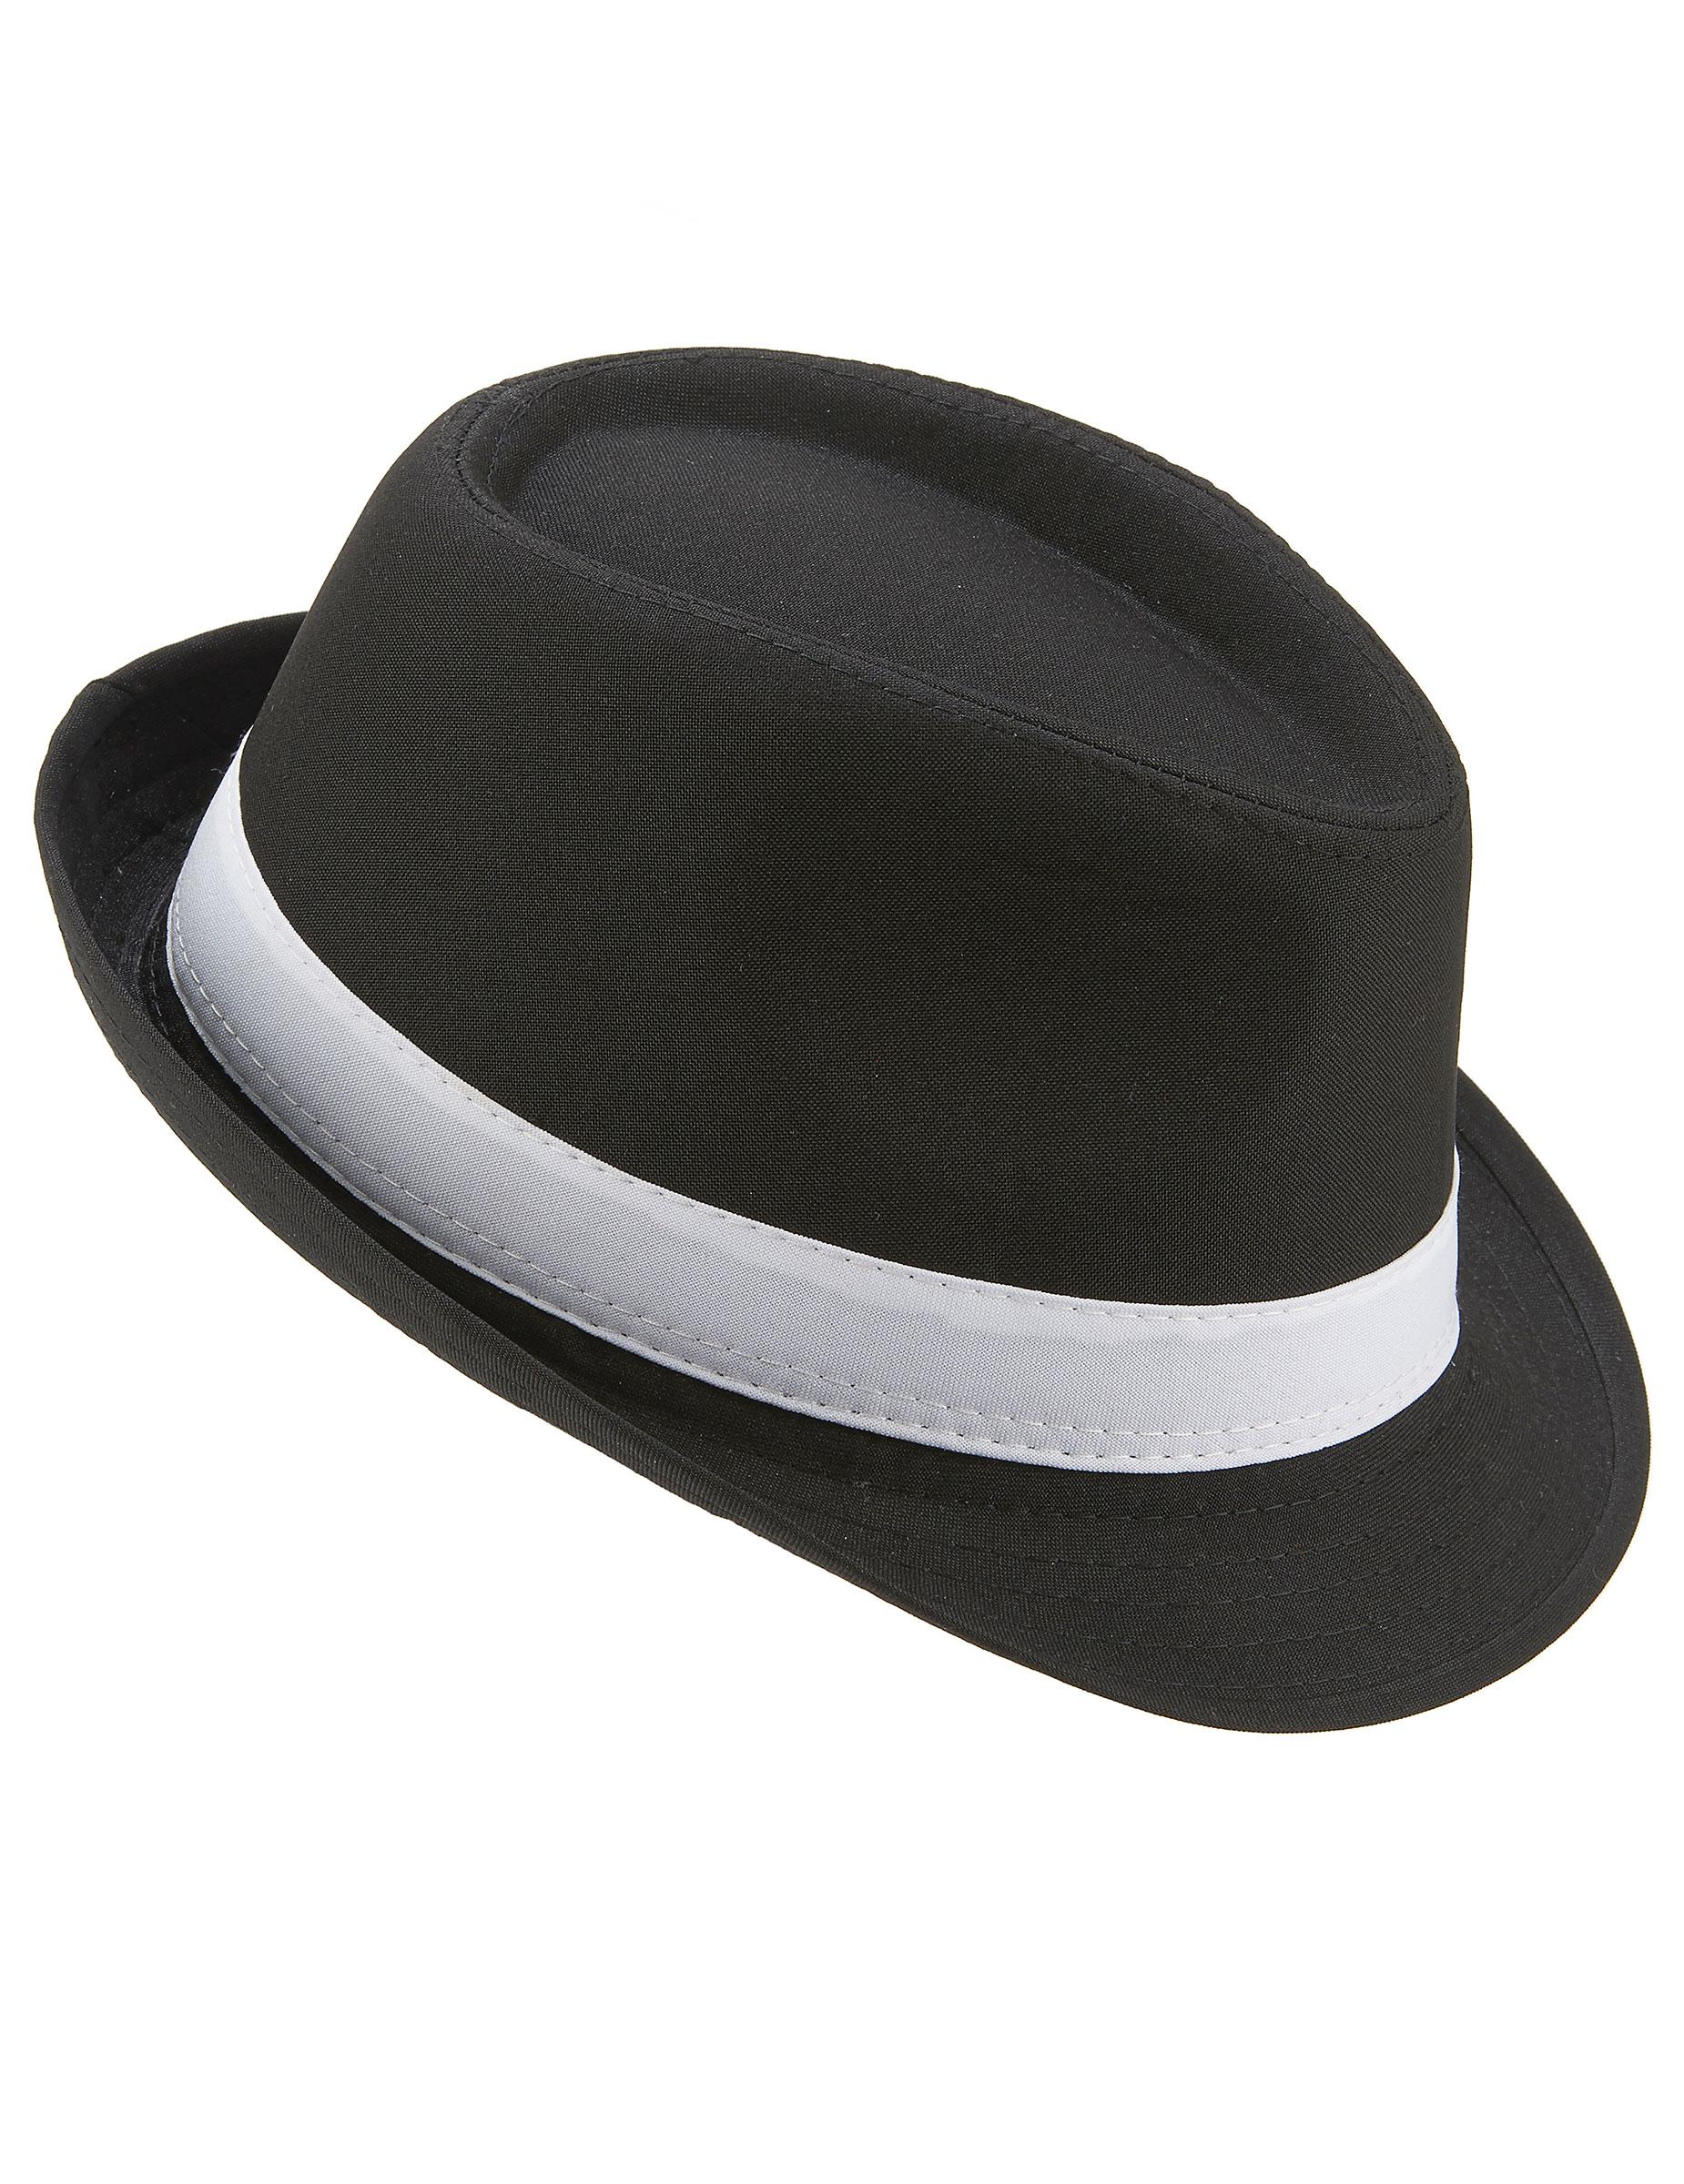 4c4335ab2eea4 Chapéu borsalino preto com faixa branca adulto  Chapéus